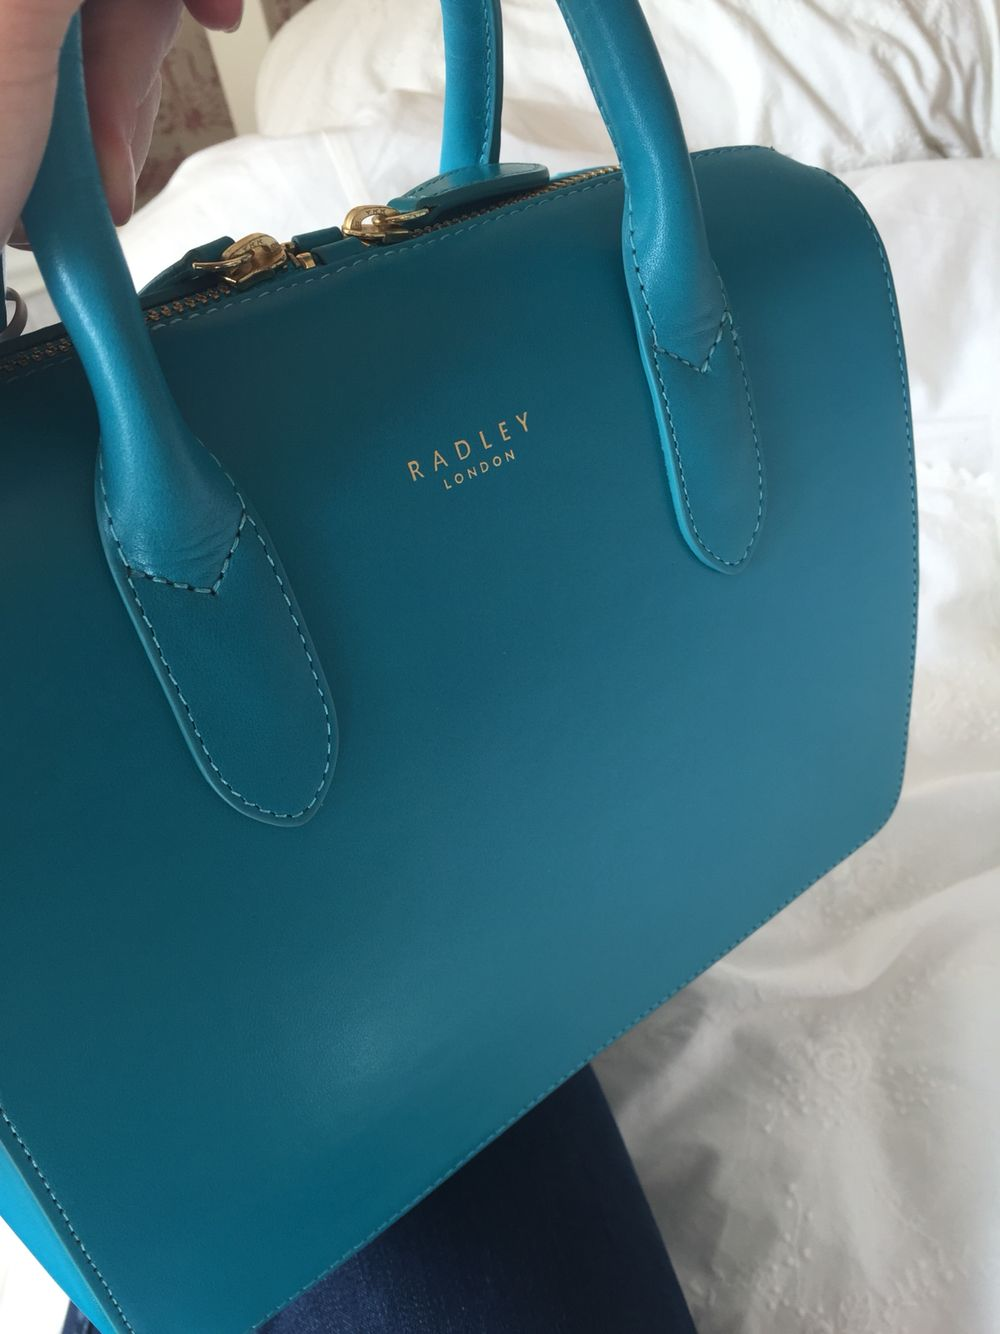 d5cf0e61e6 Petrol blue Radley handbag  Radley  fashion  basics Radley Handbags